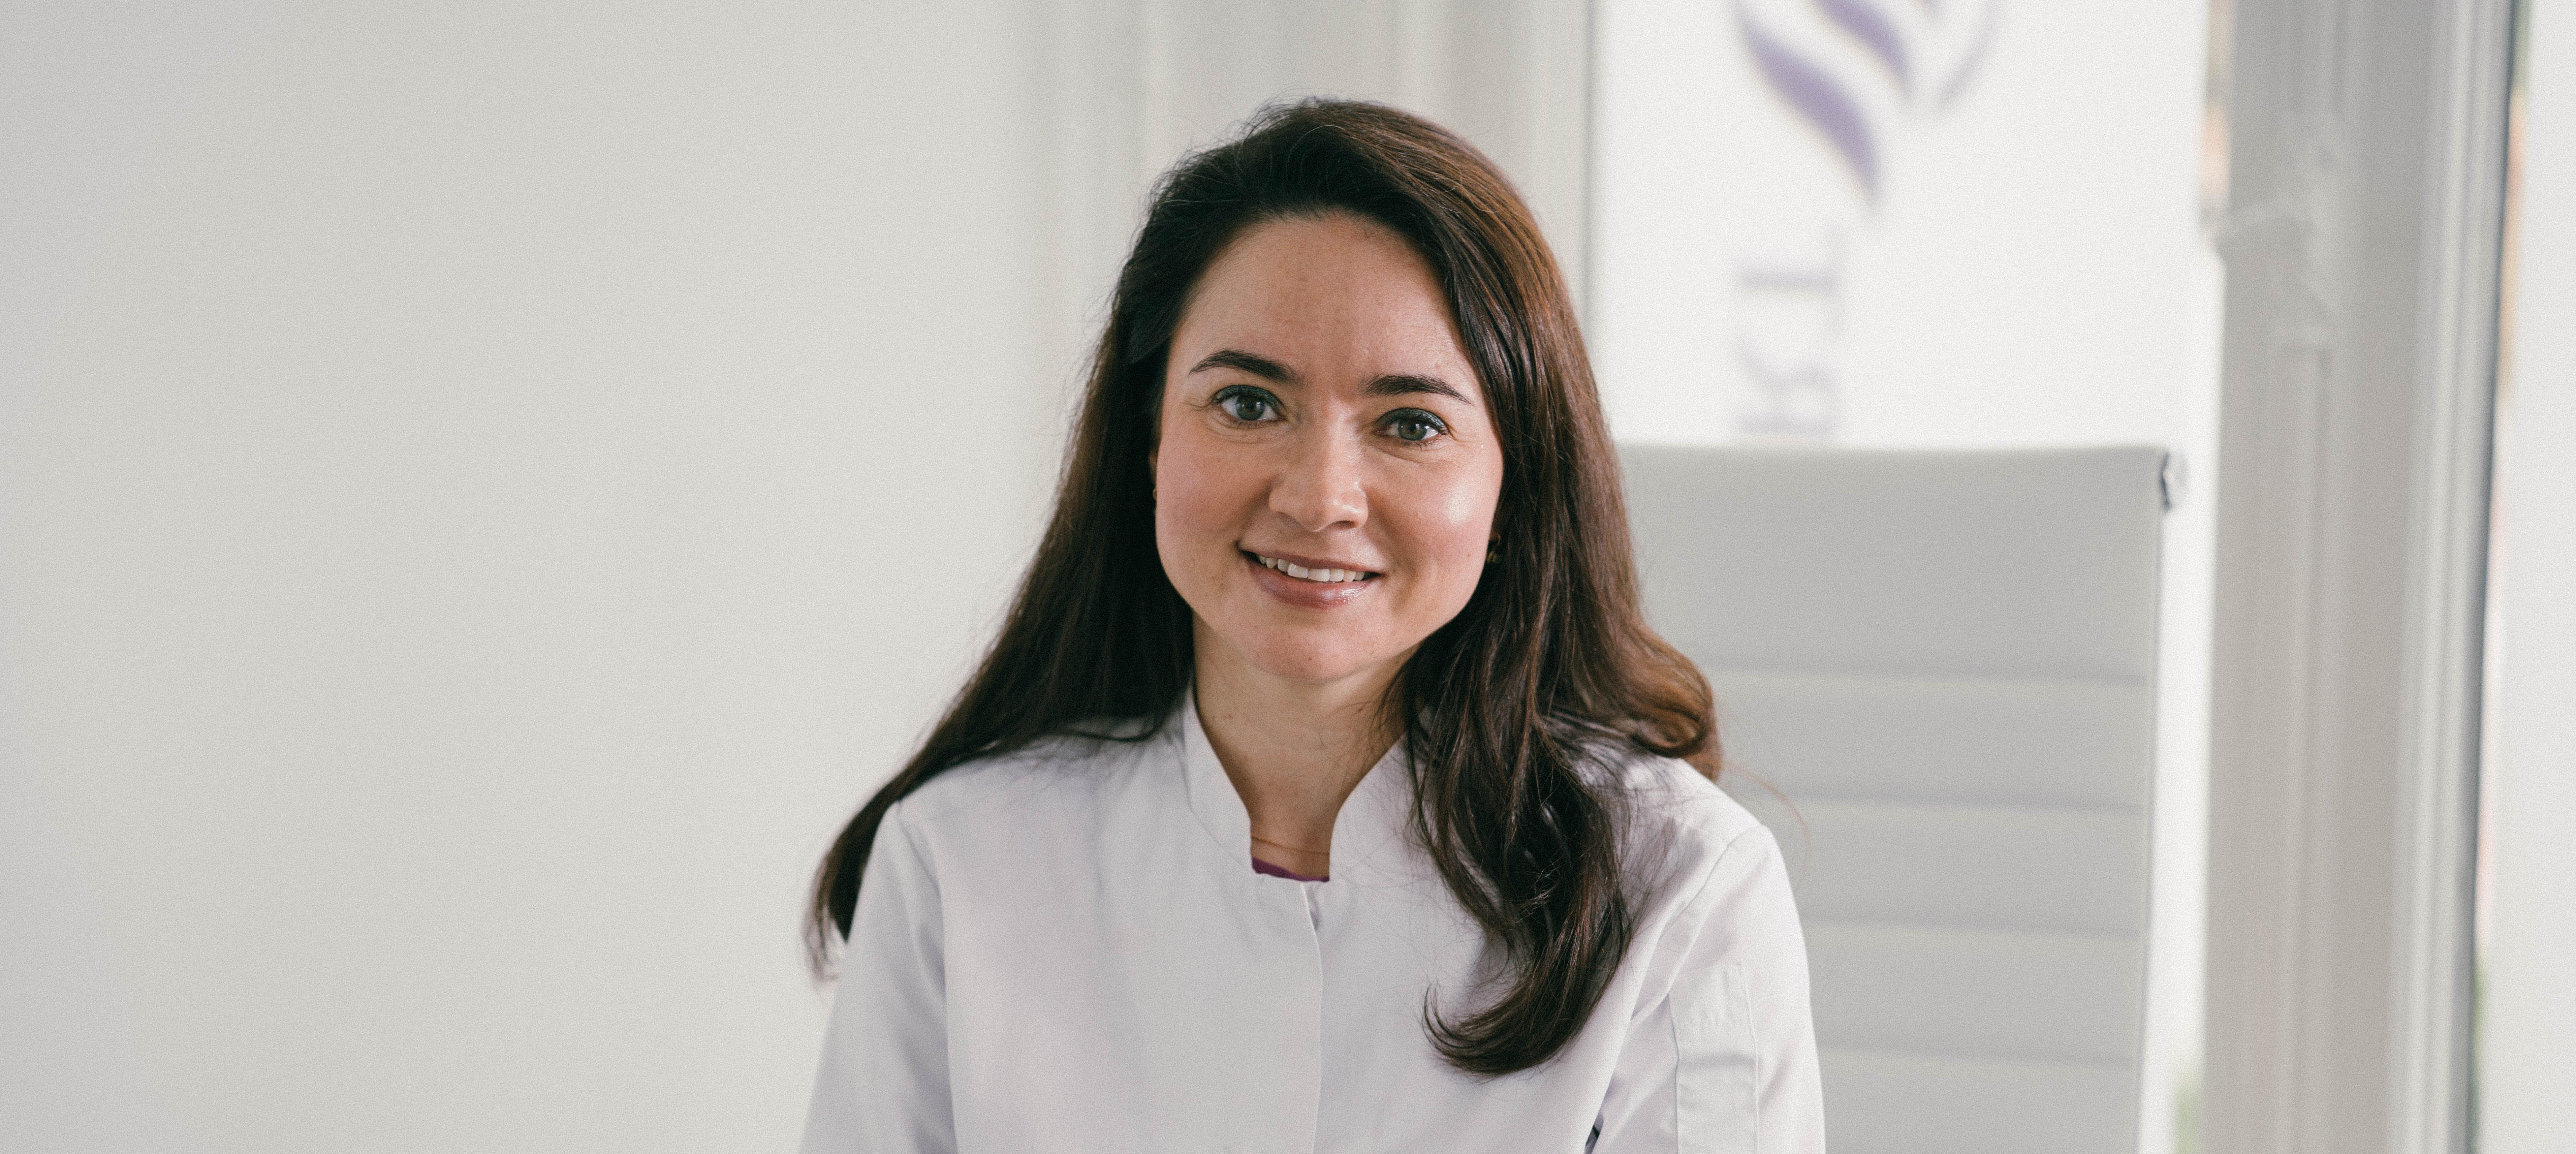 Cosmetisch arts Olga Liplavk